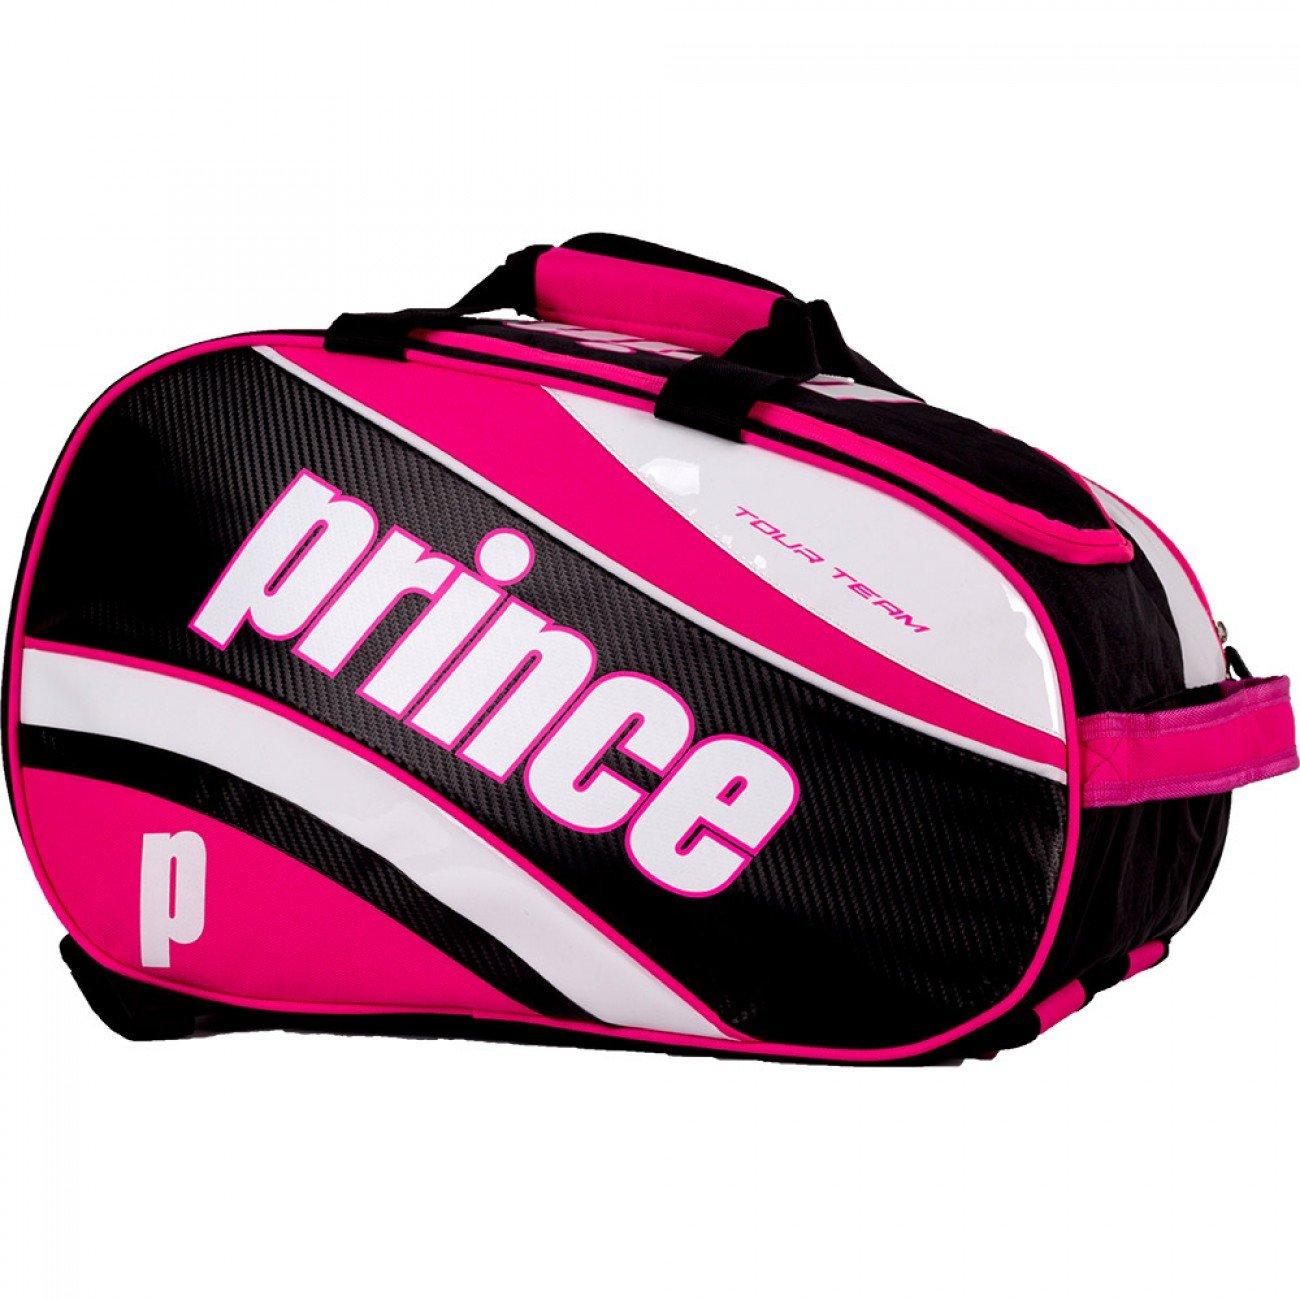 PRINCE Paletero Padel Tour Team: Amazon.es: Deportes y aire ...